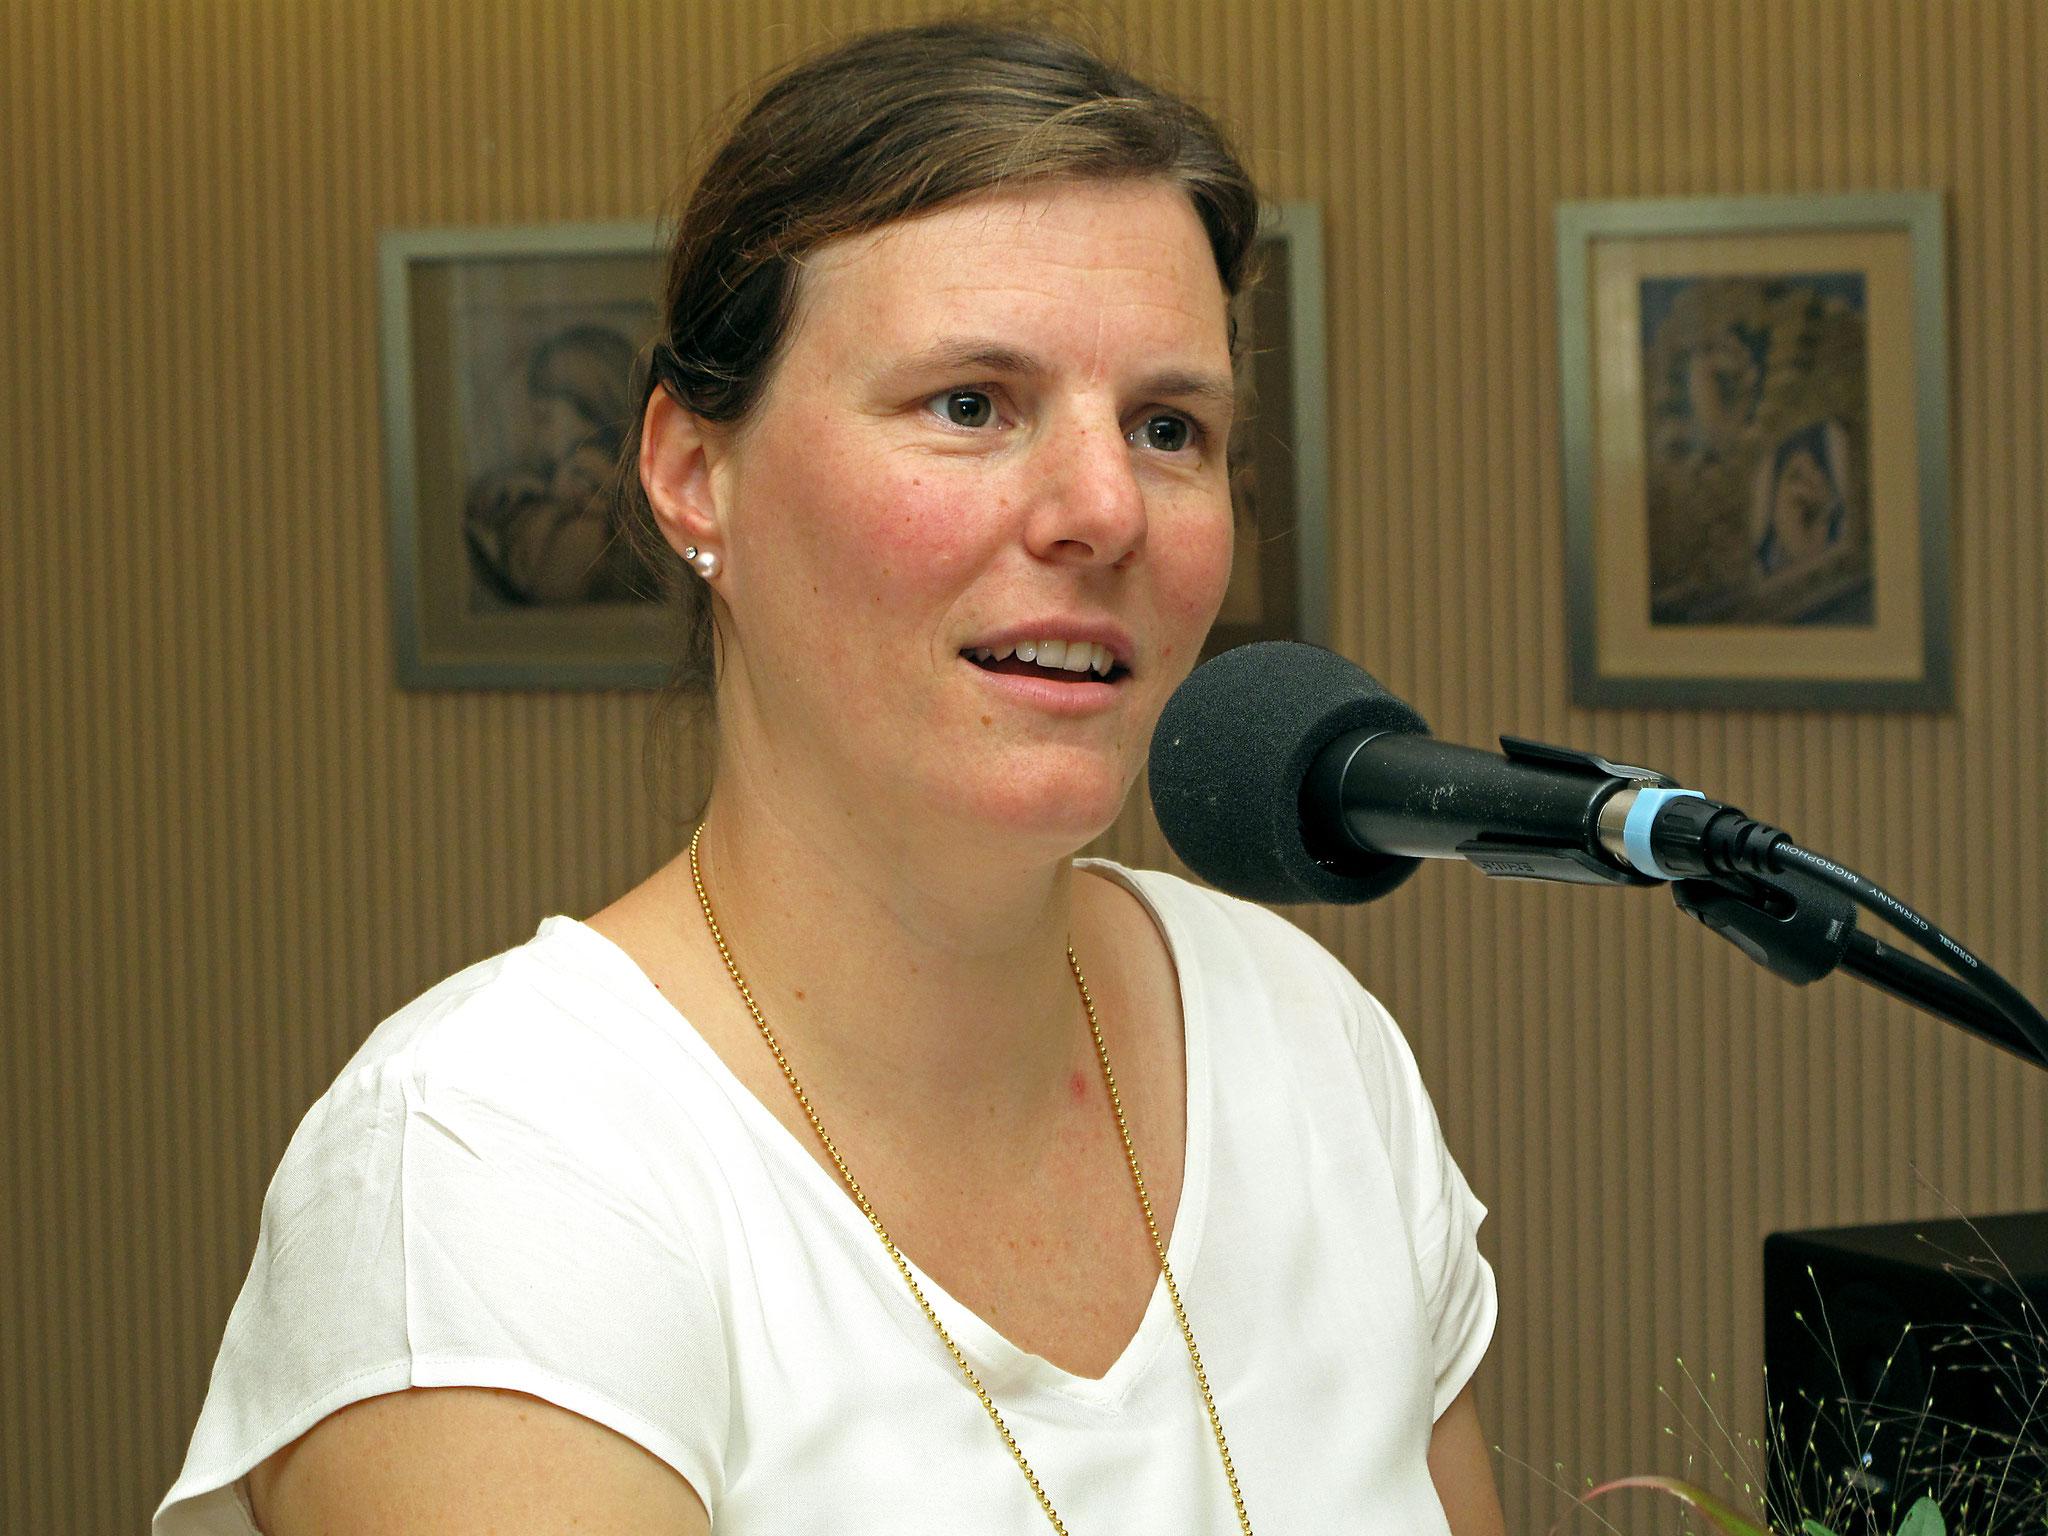 Frau Sina Känel, Familienfrau und Politikerin